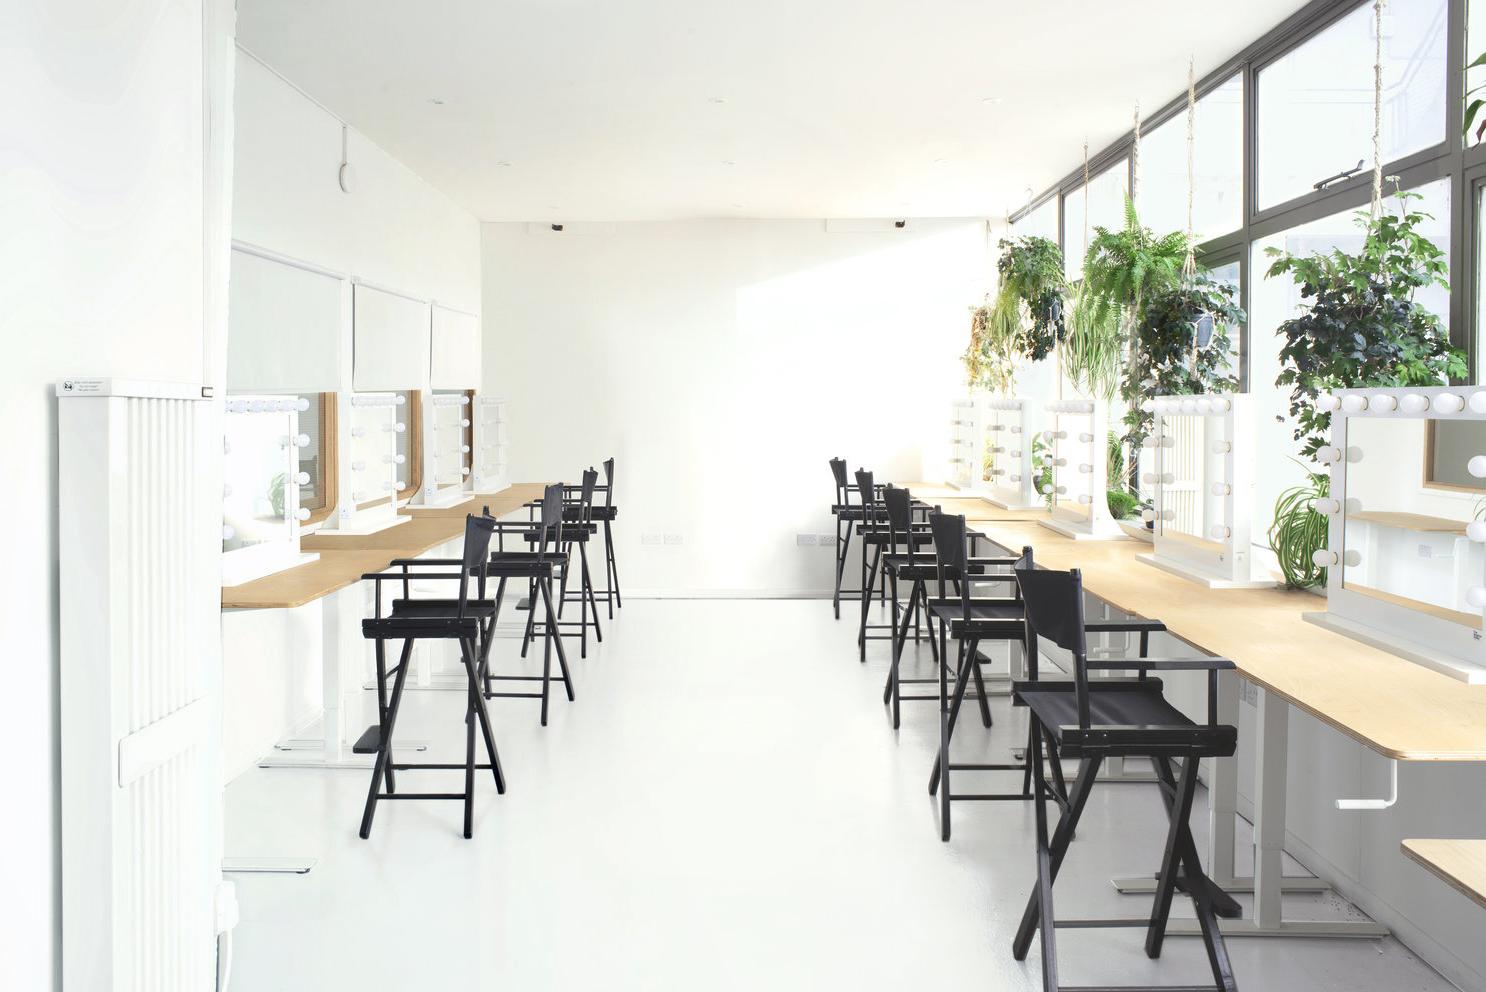 Make-up school, Workshop, Teaching set up in Workspace at The Brighton Studio